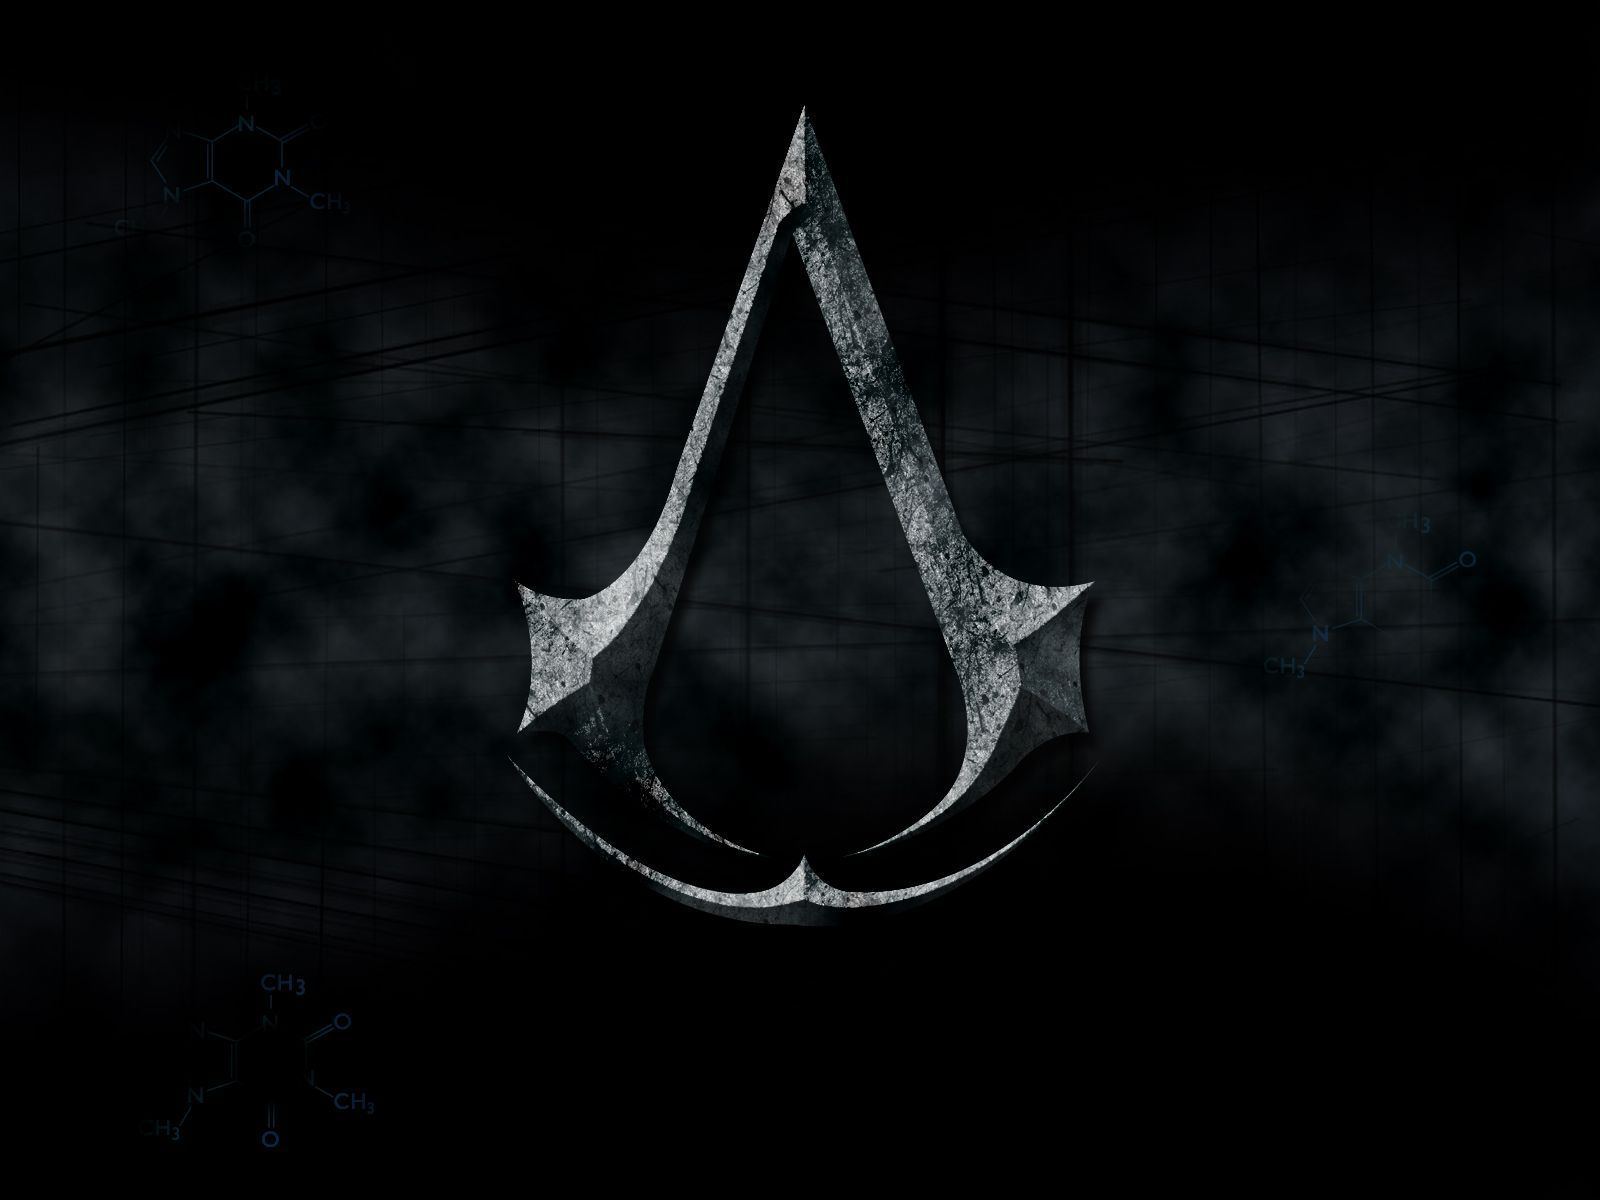 Assassins Creed Wallpapers Hd Wallpaper 1920 1080 Assassin Creed Backgrounds 21 Wallpa Assassin S Creed Wallpaper Assassins Creed Logo All Assassin S Creed